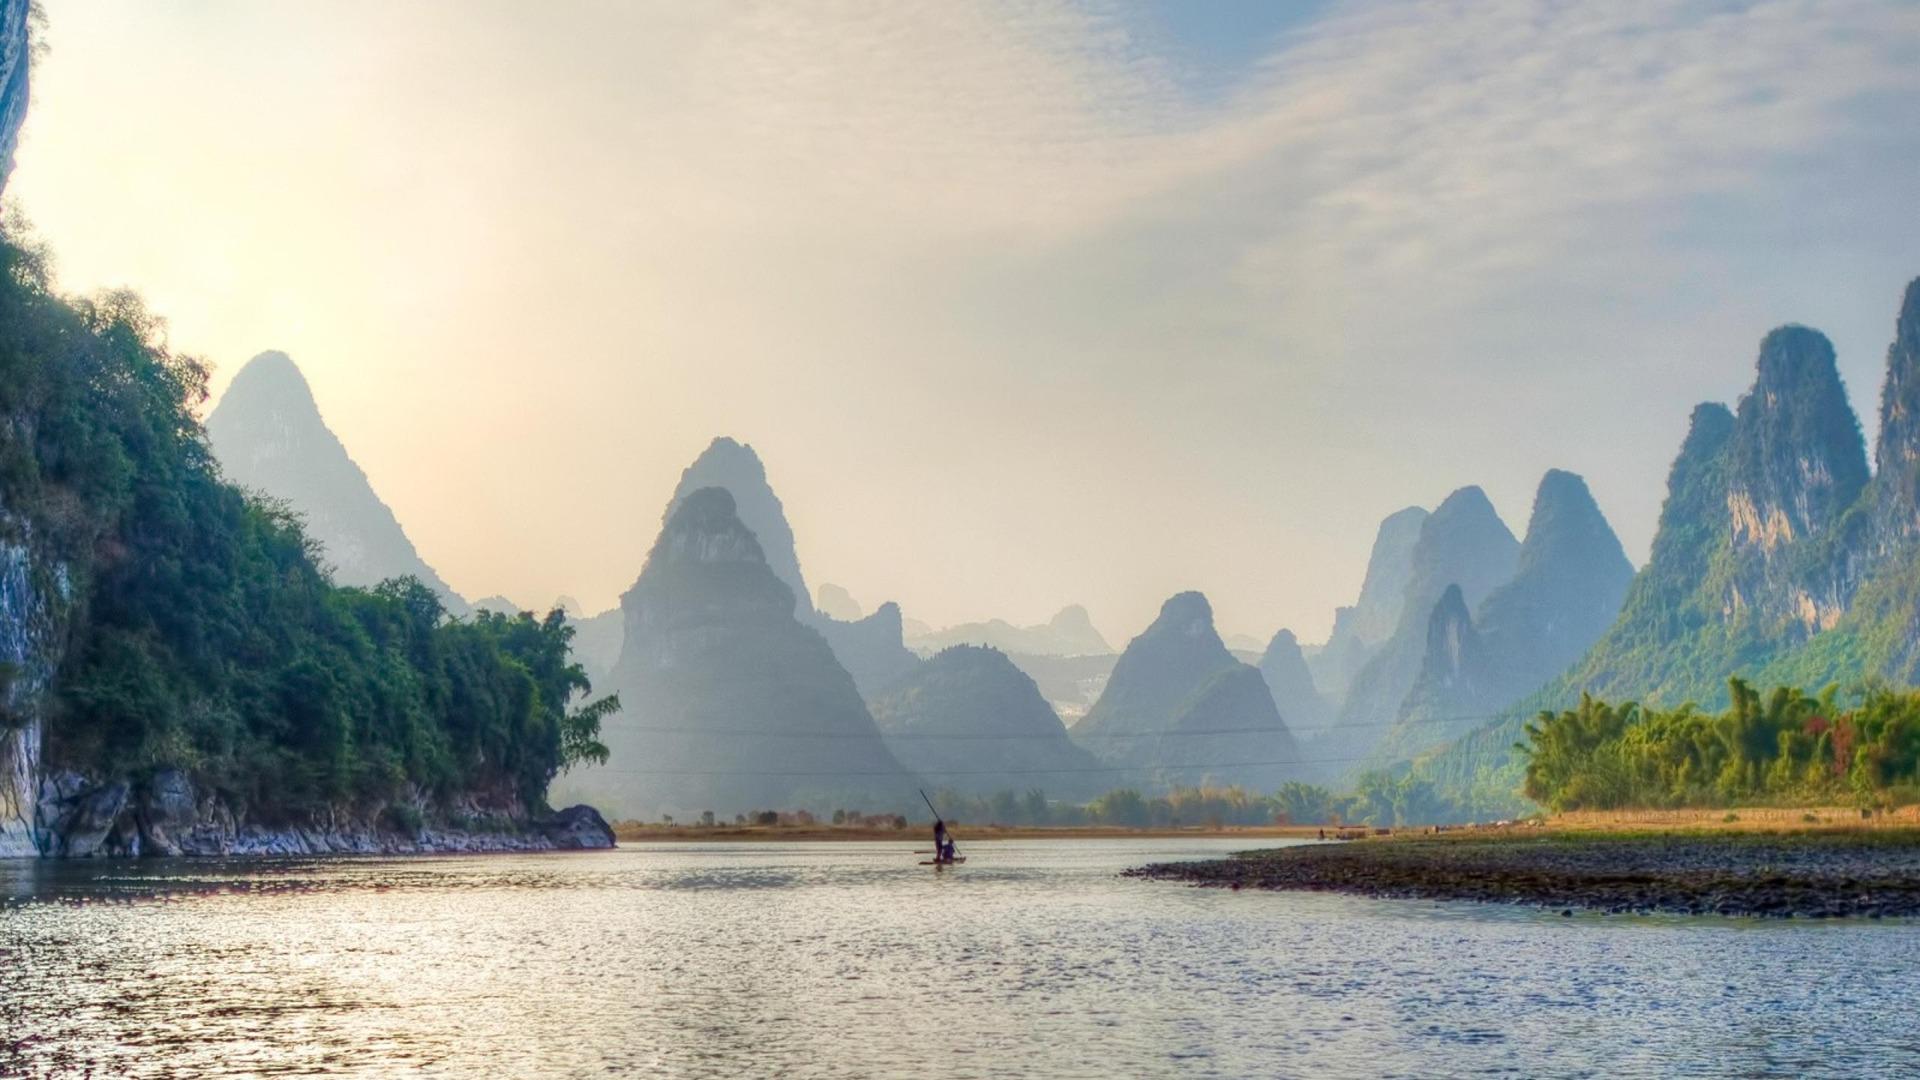 Lijiang_River_Guilin_China-Nature_Landscape_Wallpapers_1920x1080 Lake Landscape Garden Design on permaculture garden design, minnesota lake landscape design, tuscan style garden design,